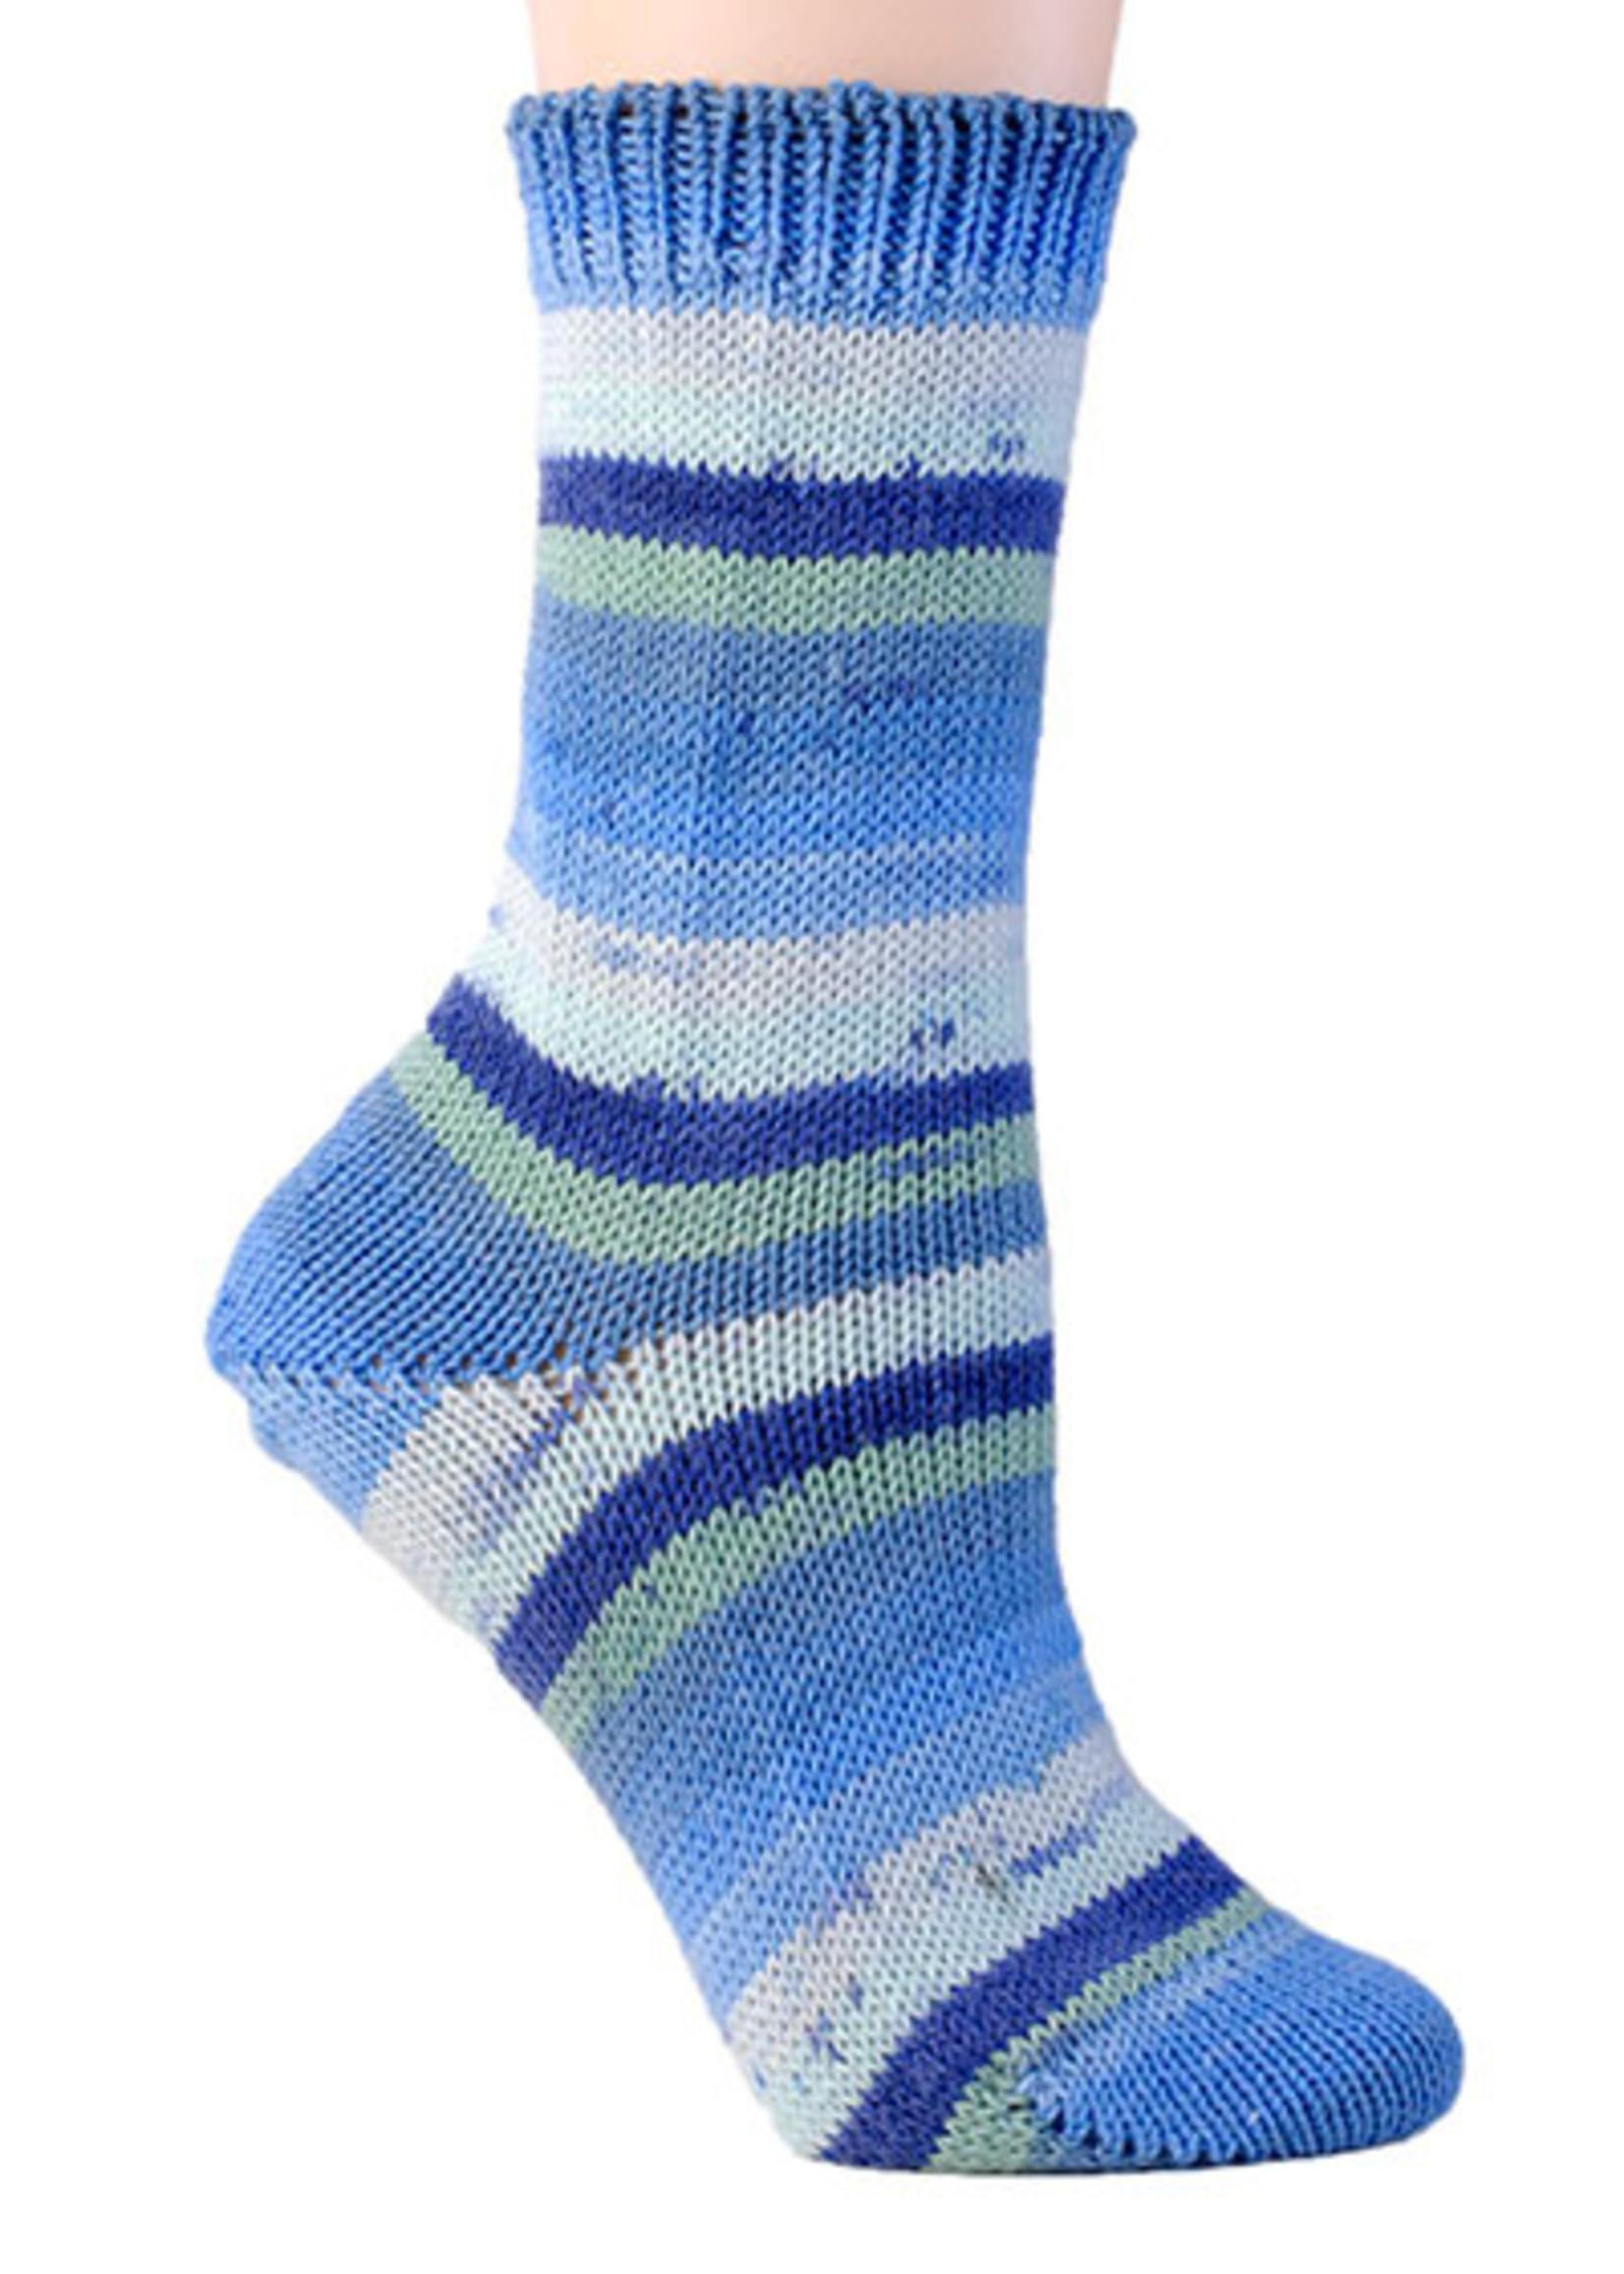 Berroco Berroco Comfort Sock Yarn #1827 Fiordland